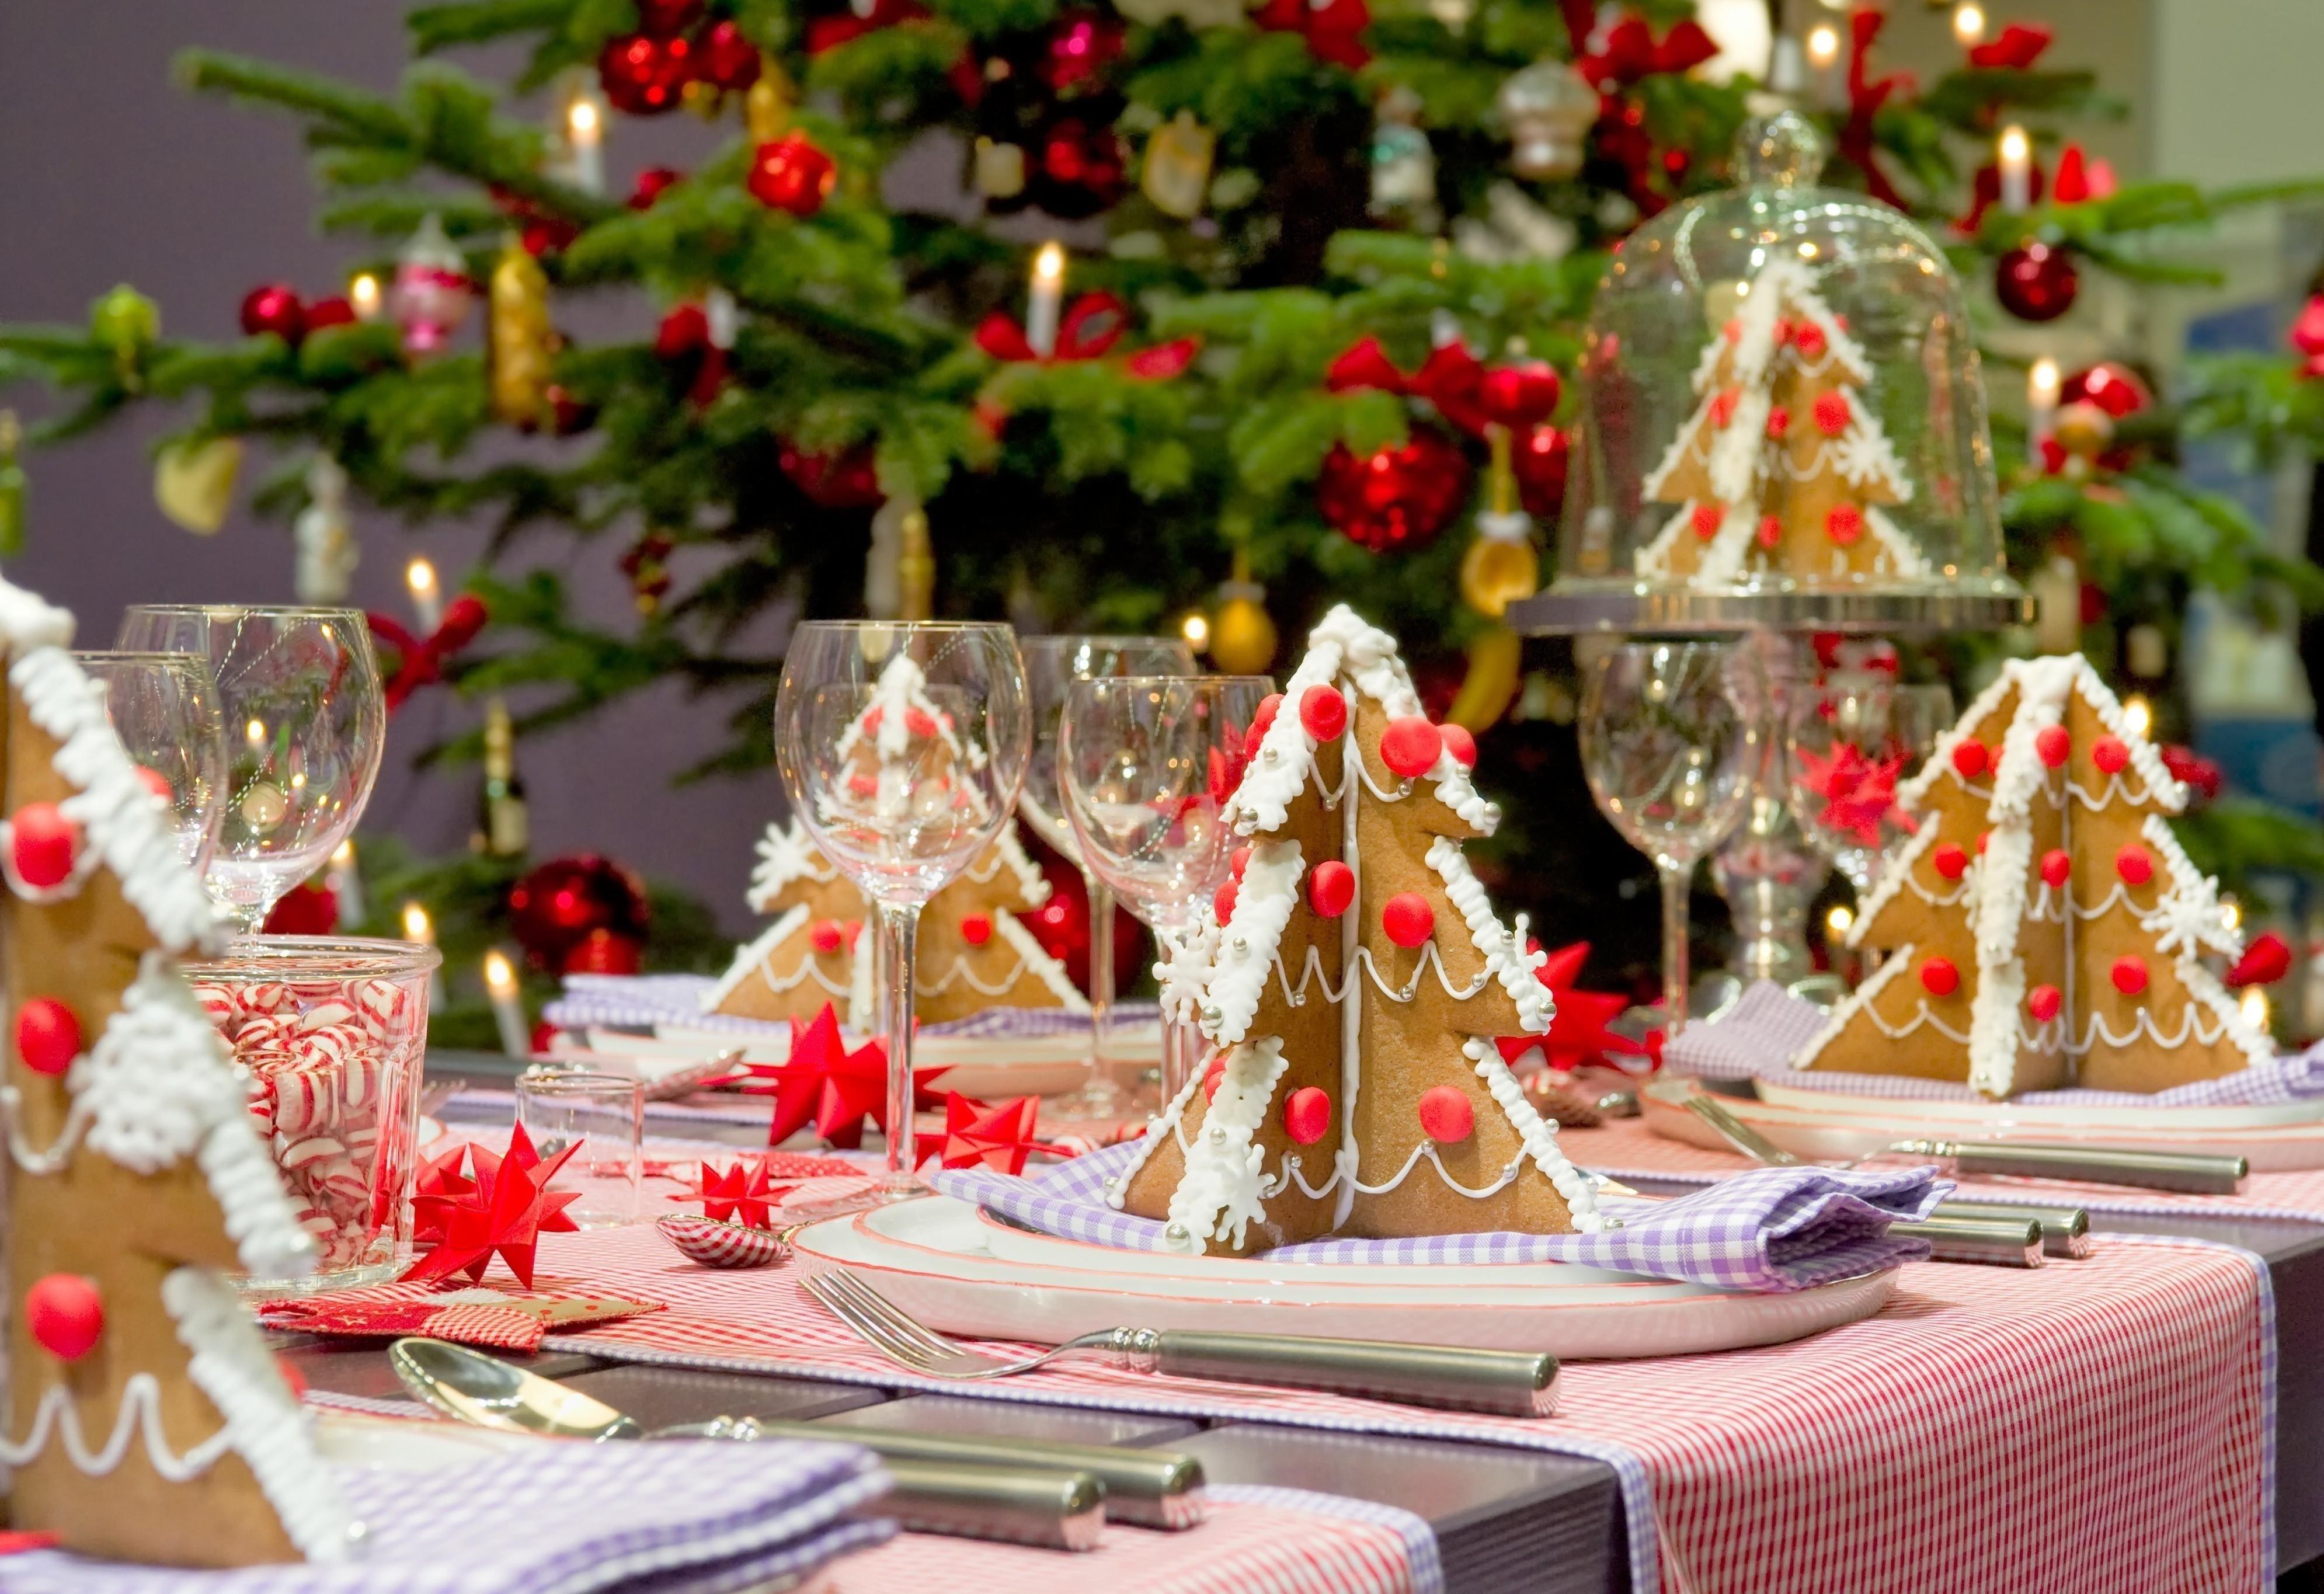 Fashionable christmas centerpiece ideas for table